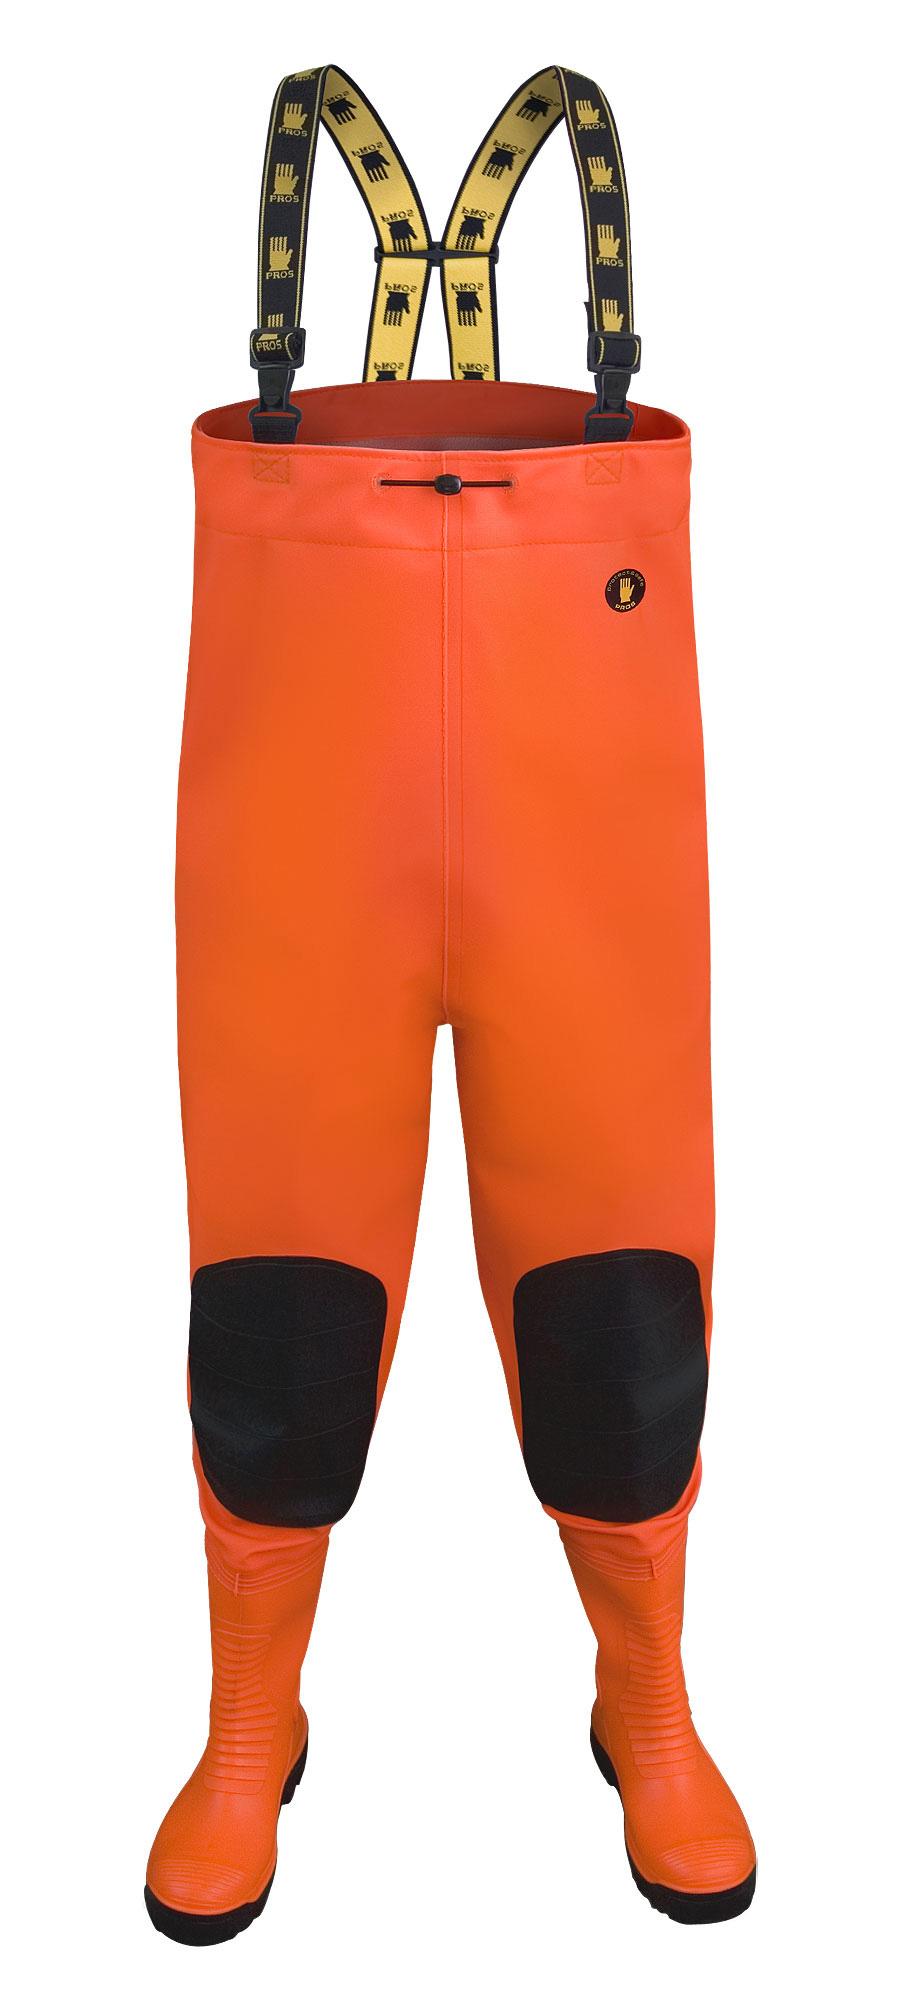 Brodící kalhoty MAX Fluo oranž vel.40    SBM01 Fluo or.  PROS